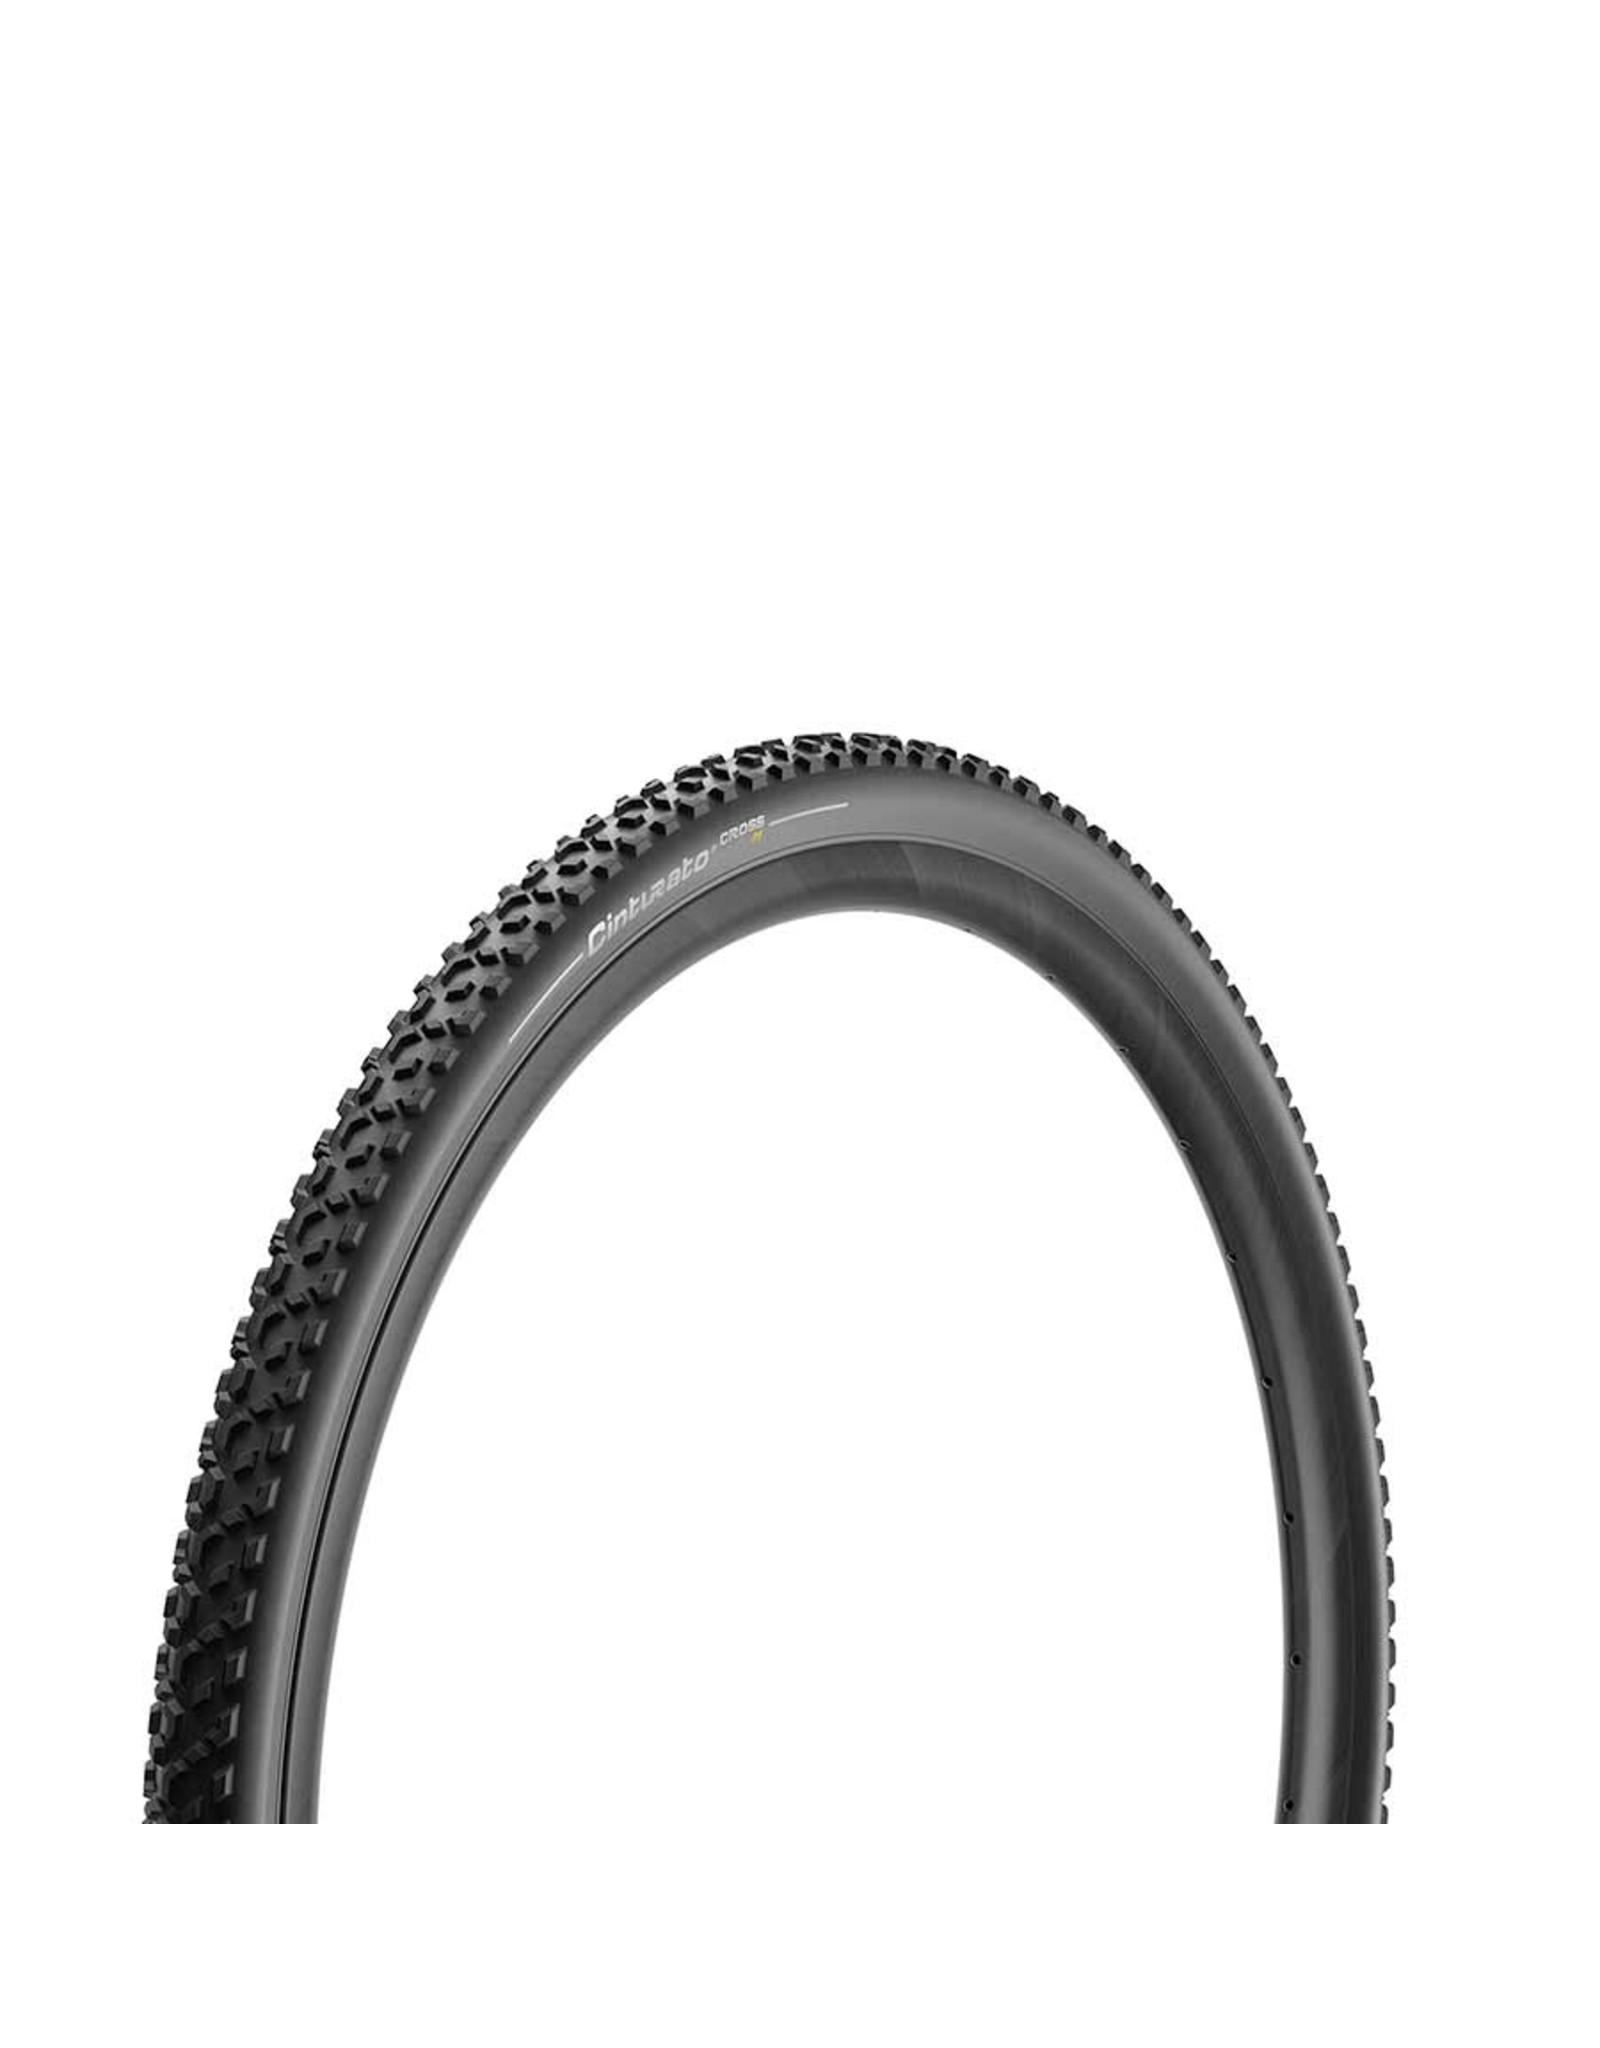 Pirelli, Cinturato Cross M, Tire, 700x33C, Folding, Tubeless Ready, SpeedGrip, 127TPI, Black